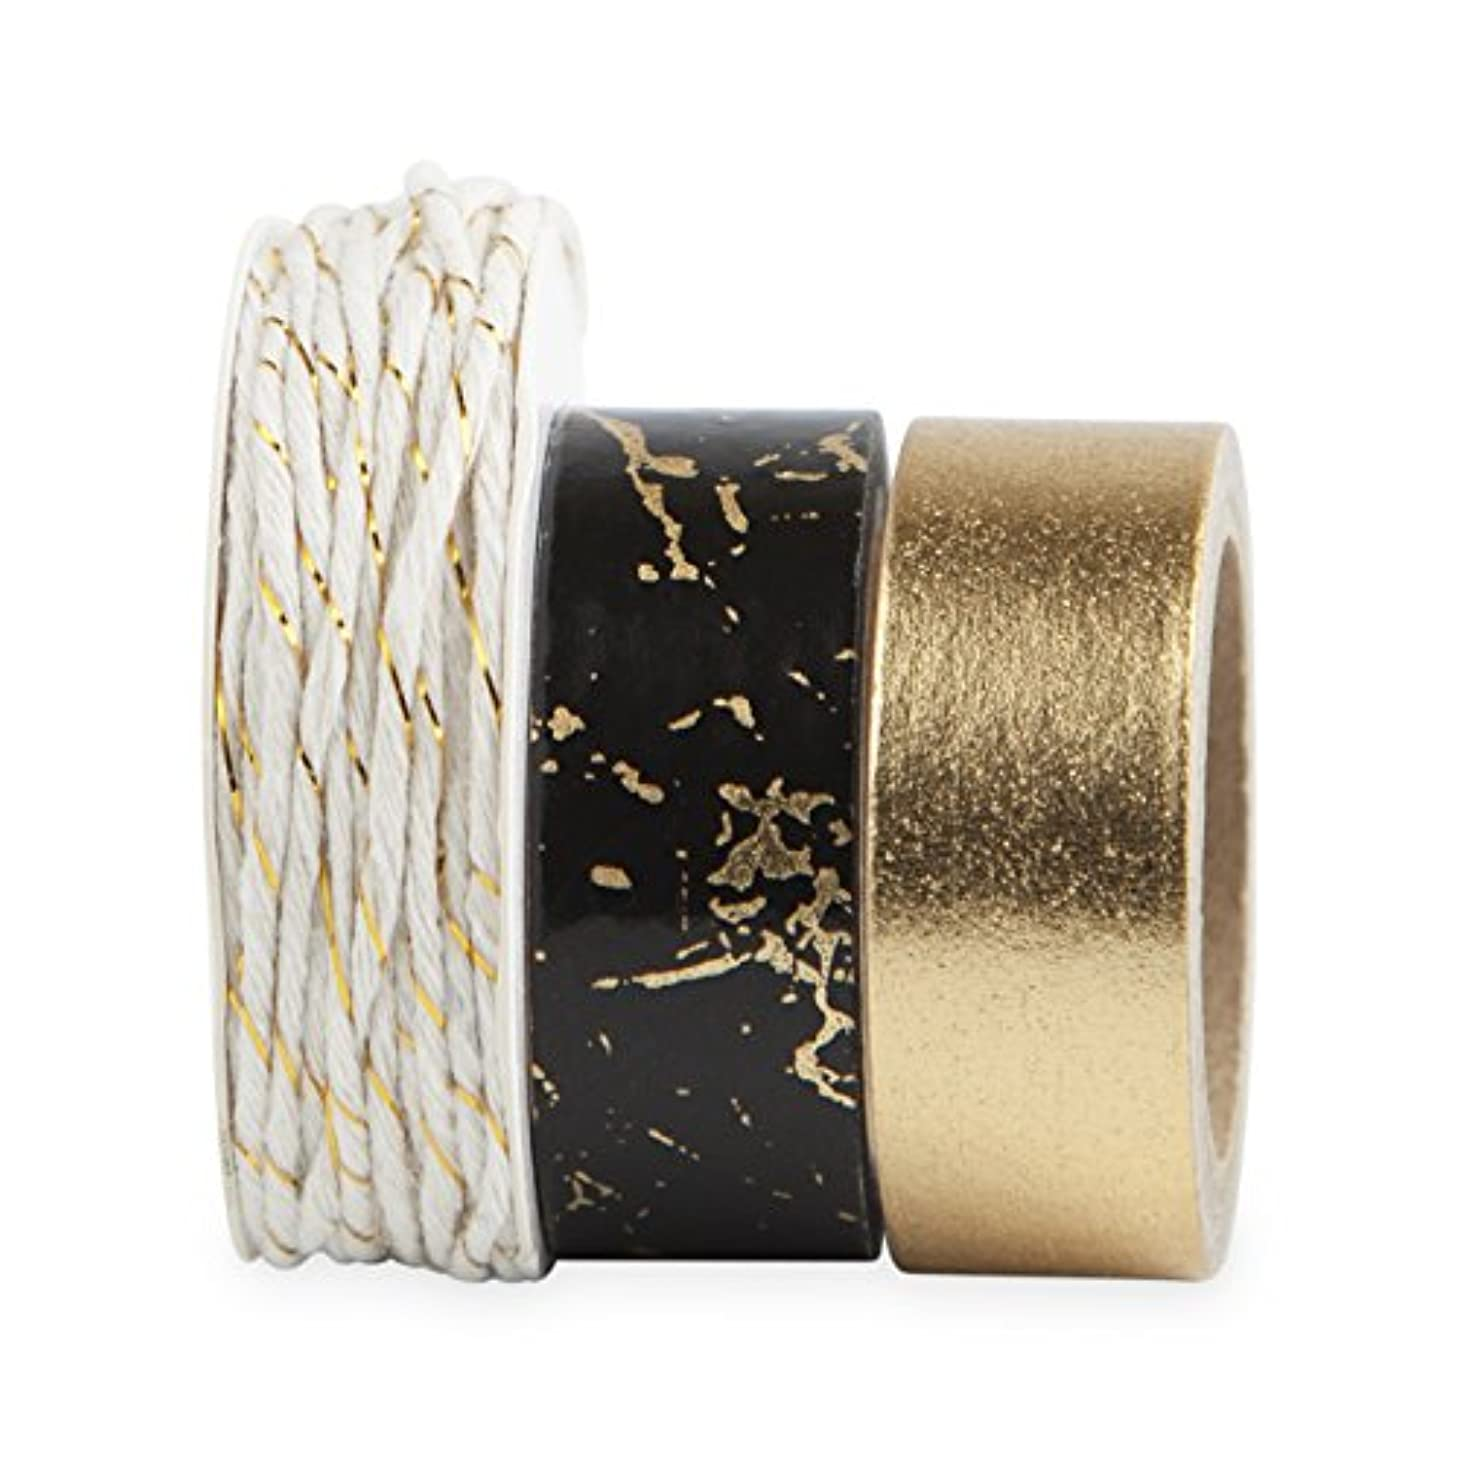 Cakewalk 6739 Gold Speckle Washi Tape & Twine Decorative Tape,